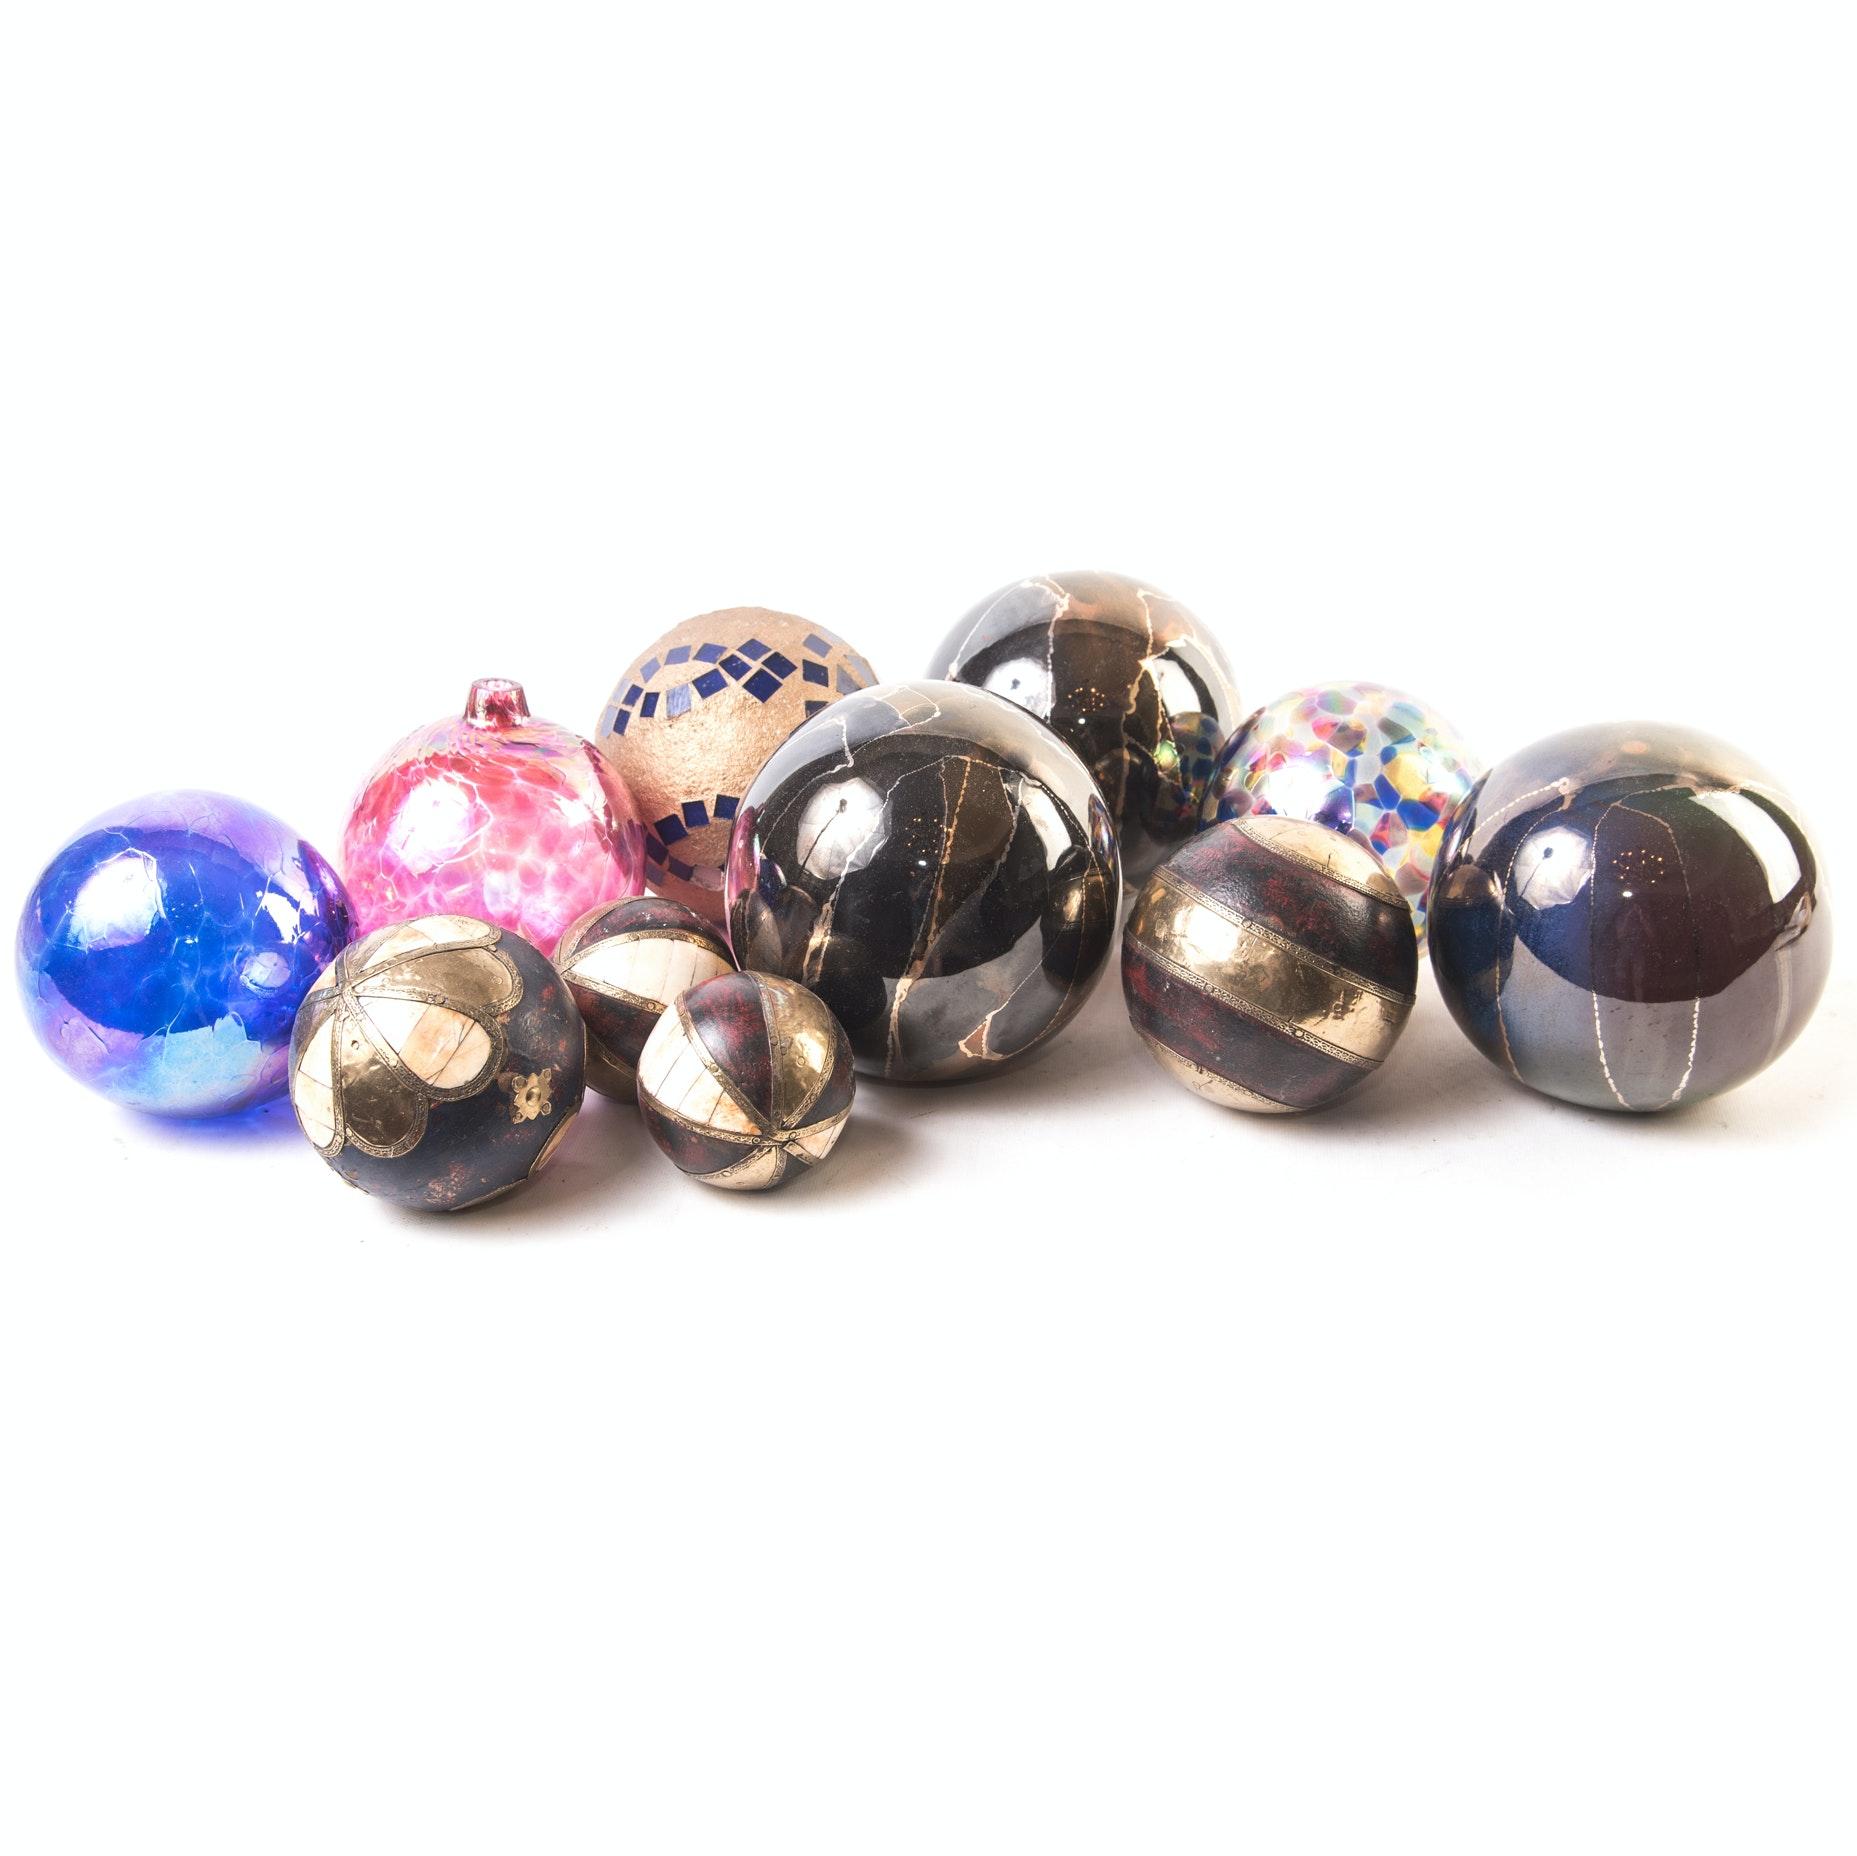 Decorative Carpet Balls and Blown Glass Ornaments